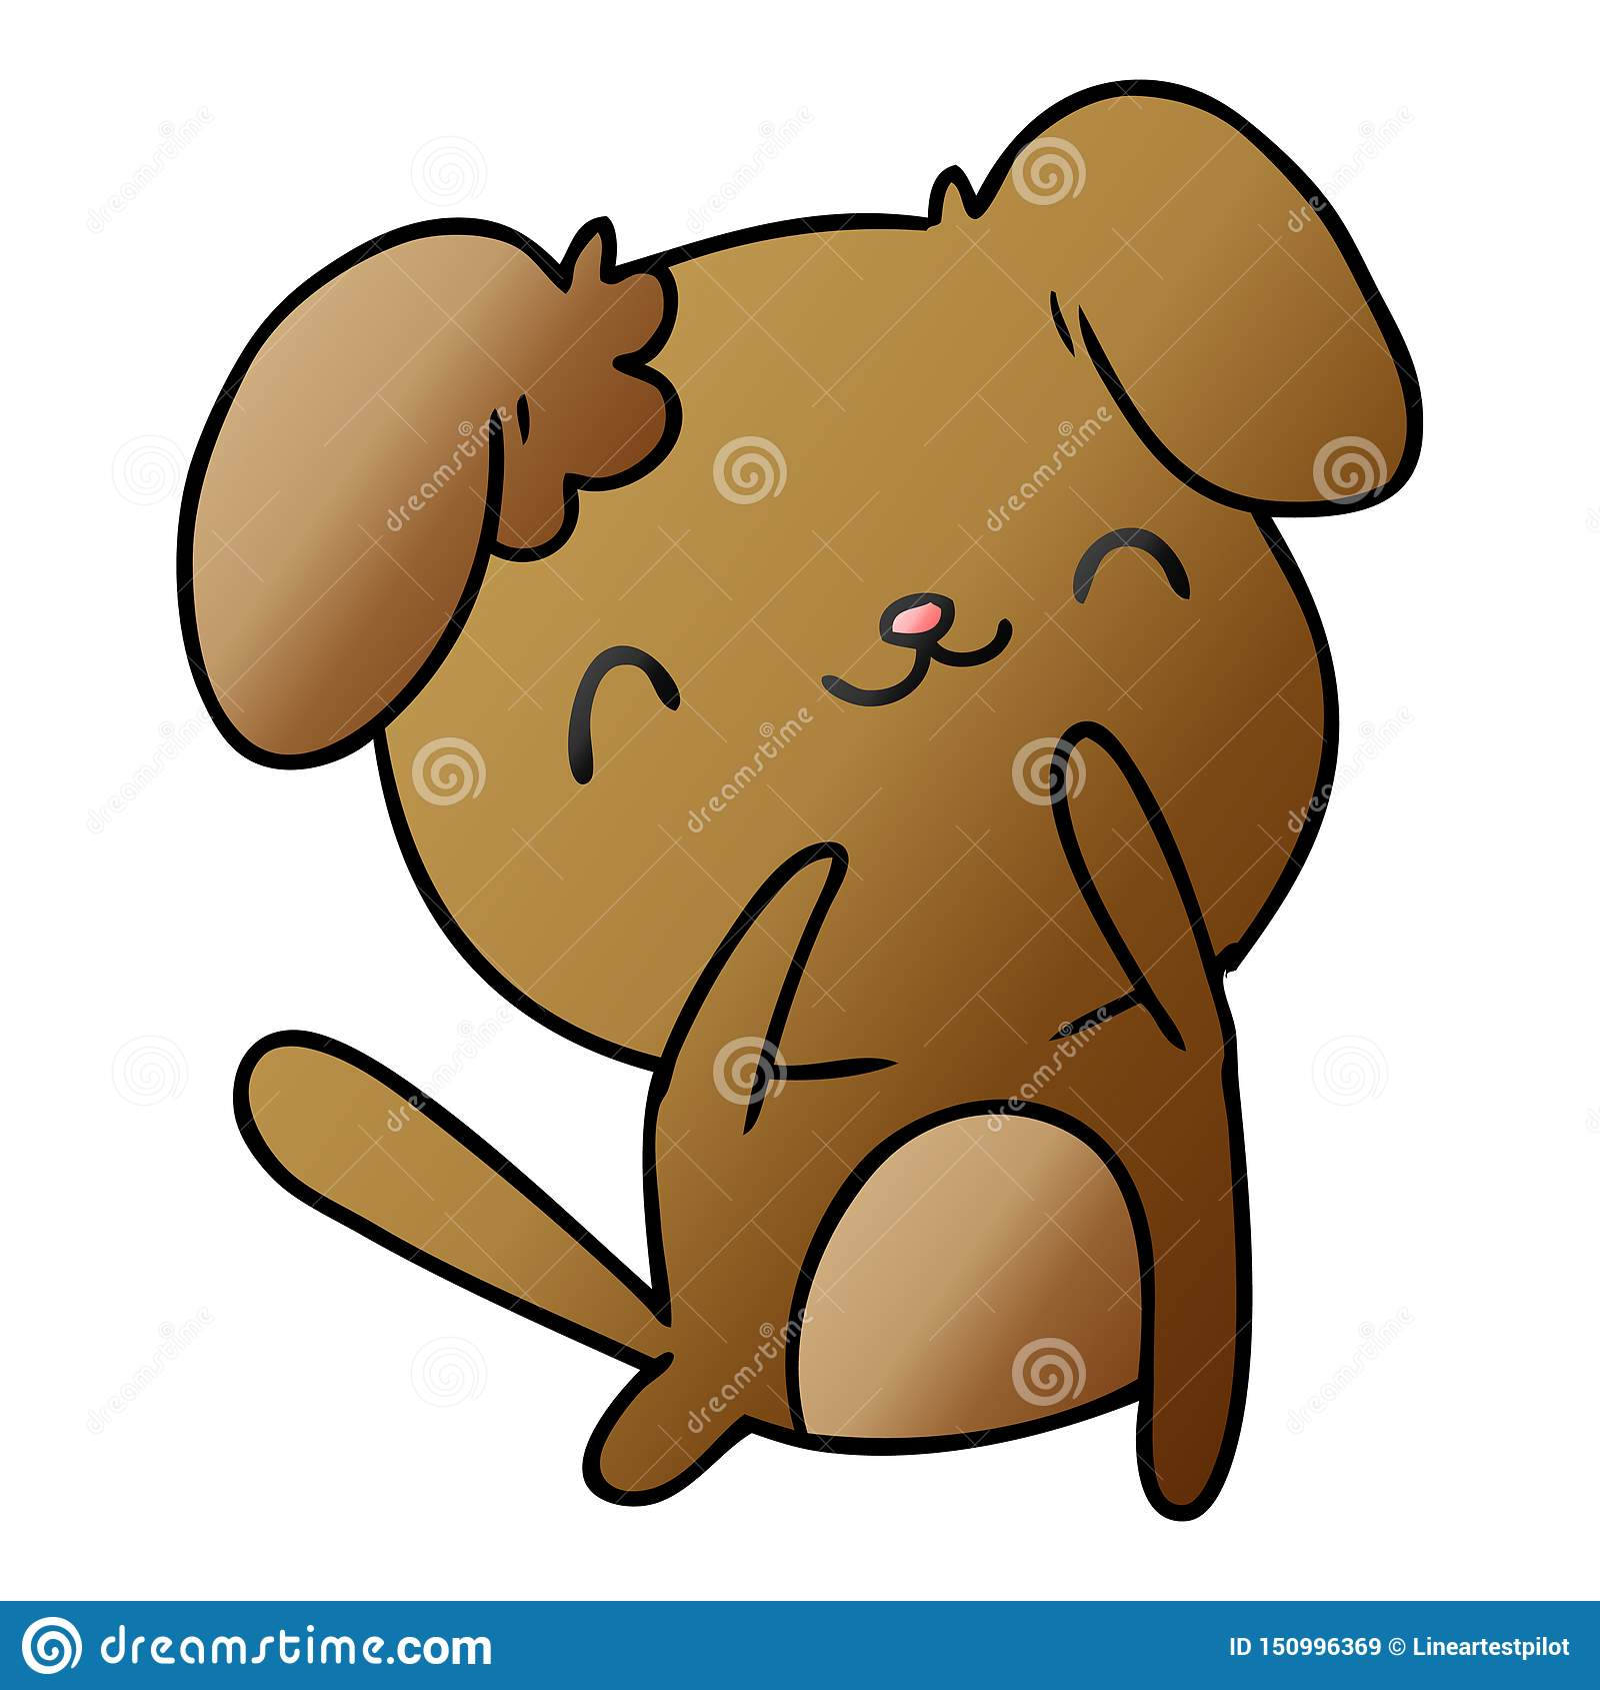 Gradient Cartoon Kawaii Cute Dog Pet Animal Furry Friend Puppy Art Illustration Drawing Doodle Quirky Freehand Drawn Free Hand Artwork Vector Stock Illustrations 5 Gradient Cartoon Kawaii Cute Dog Pet Animal